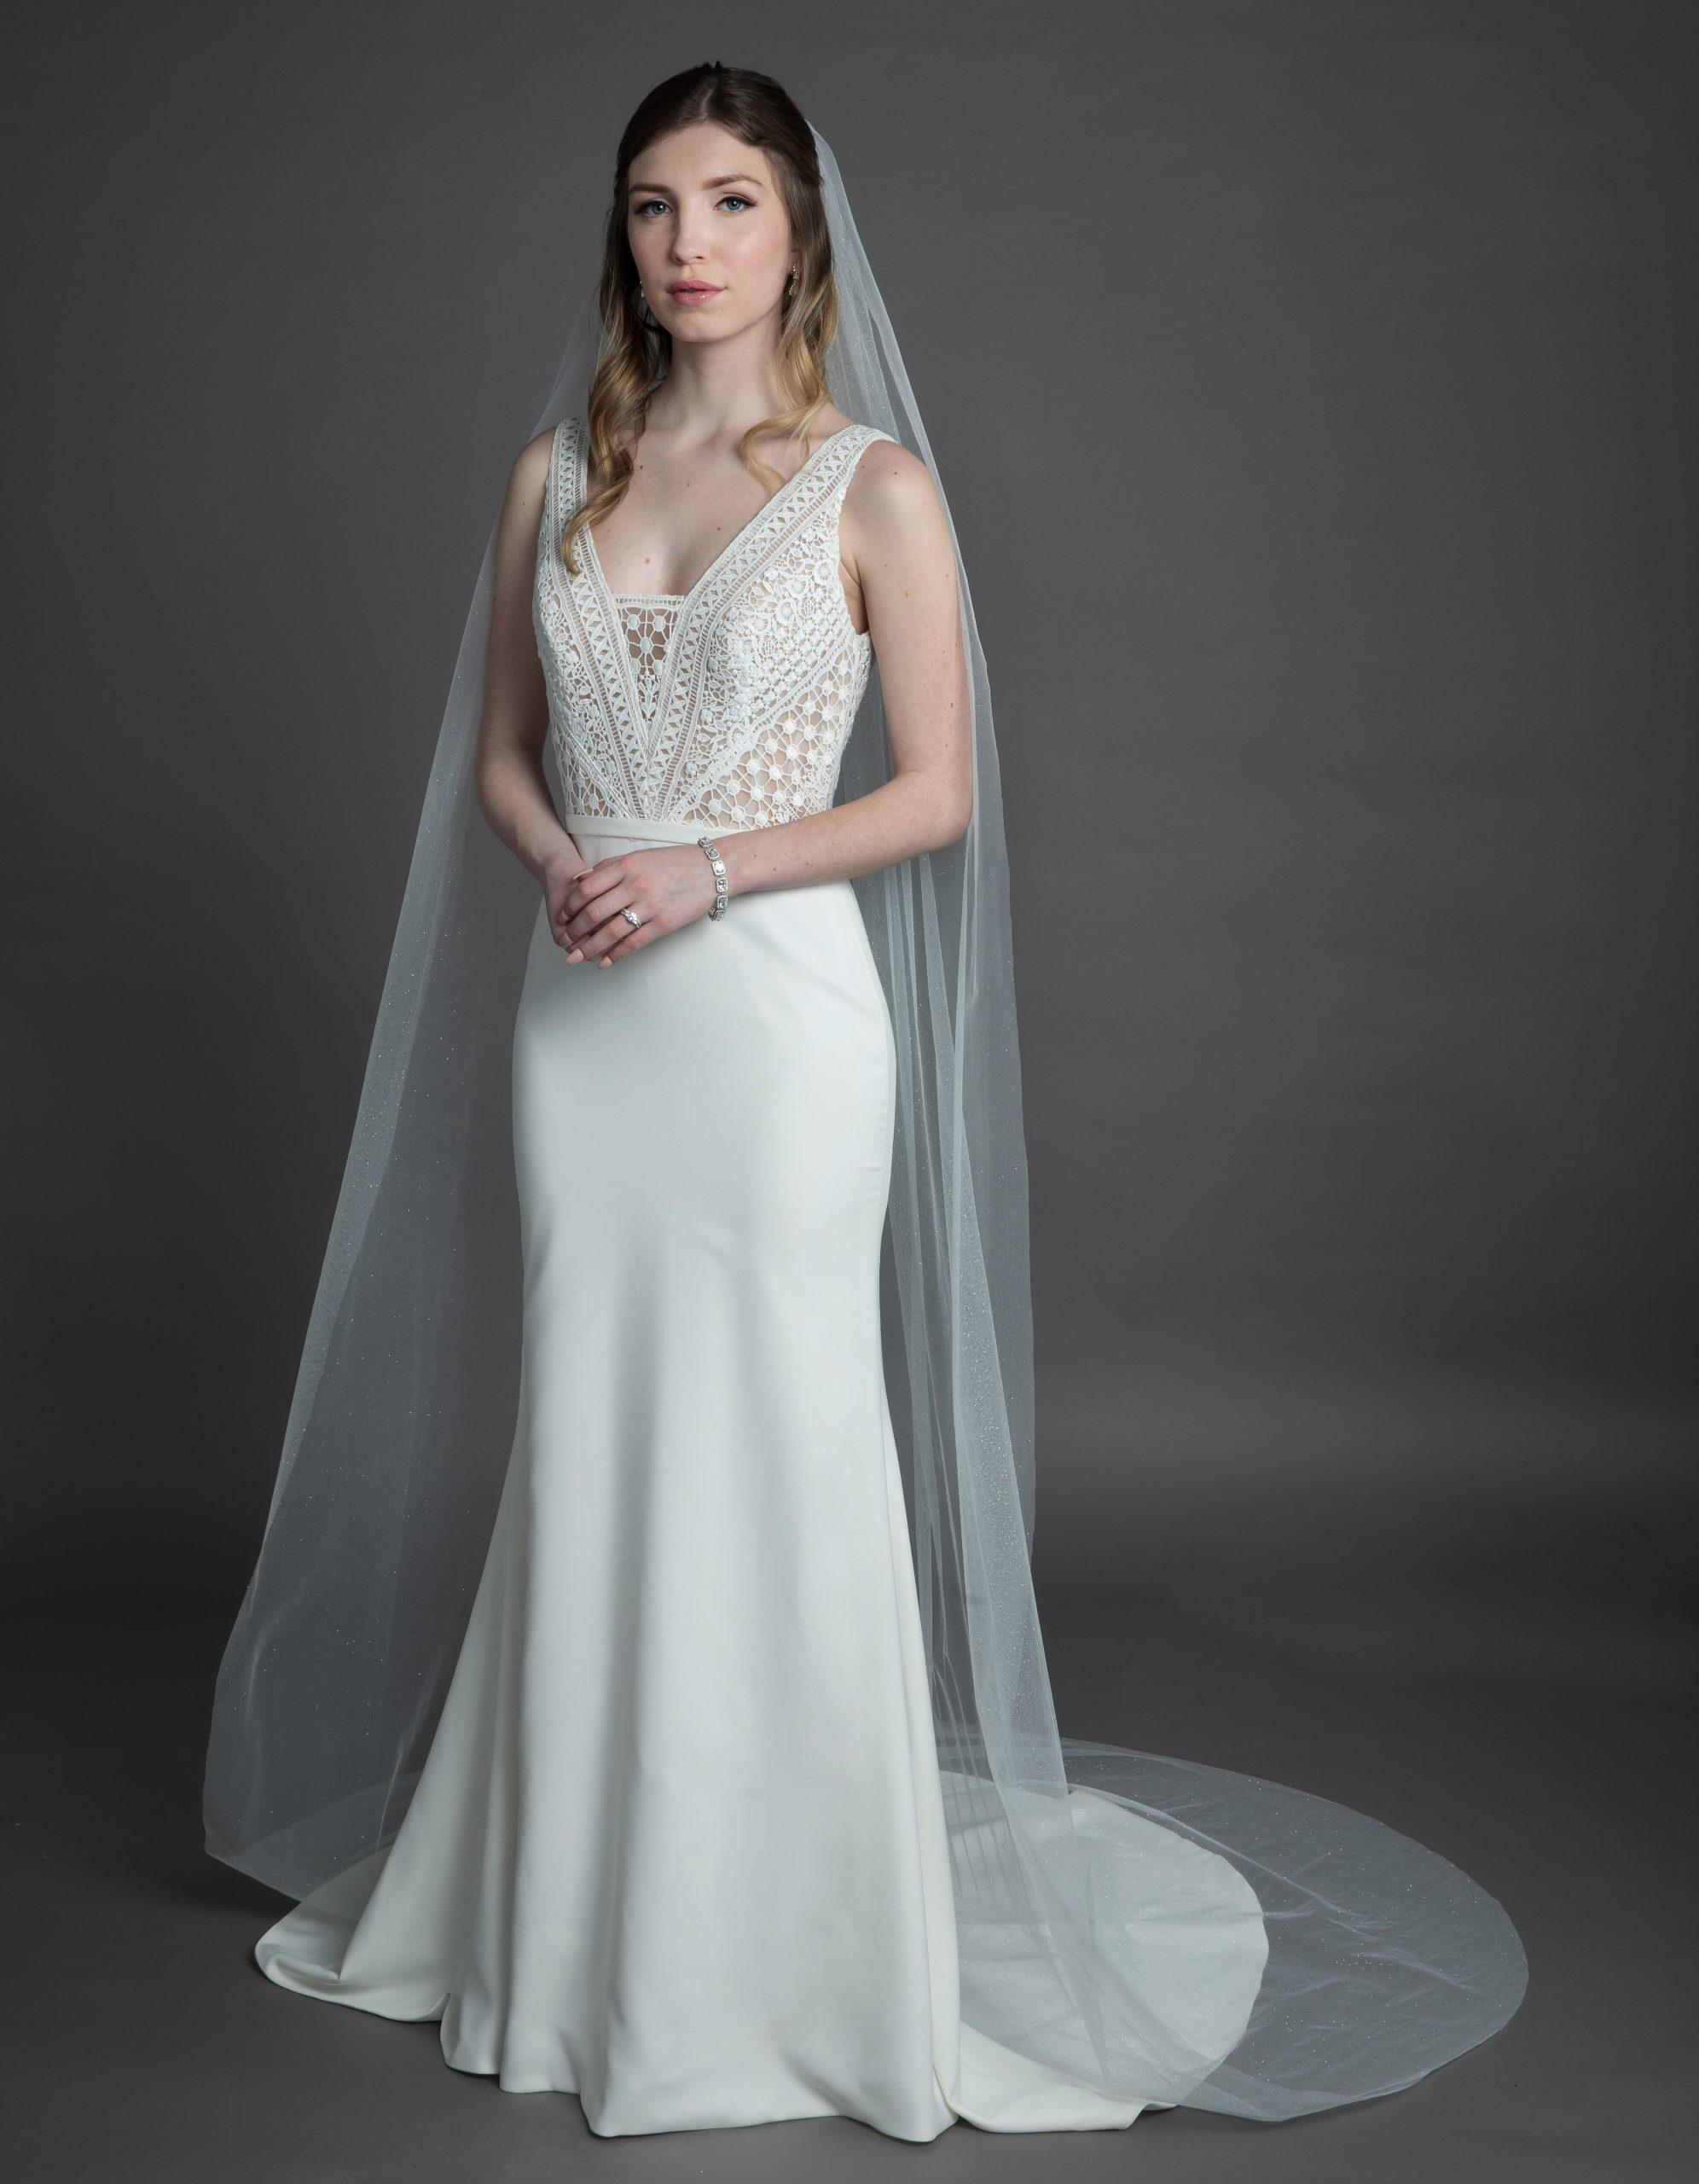 Bridal Classics Marquise Veils MV-2474